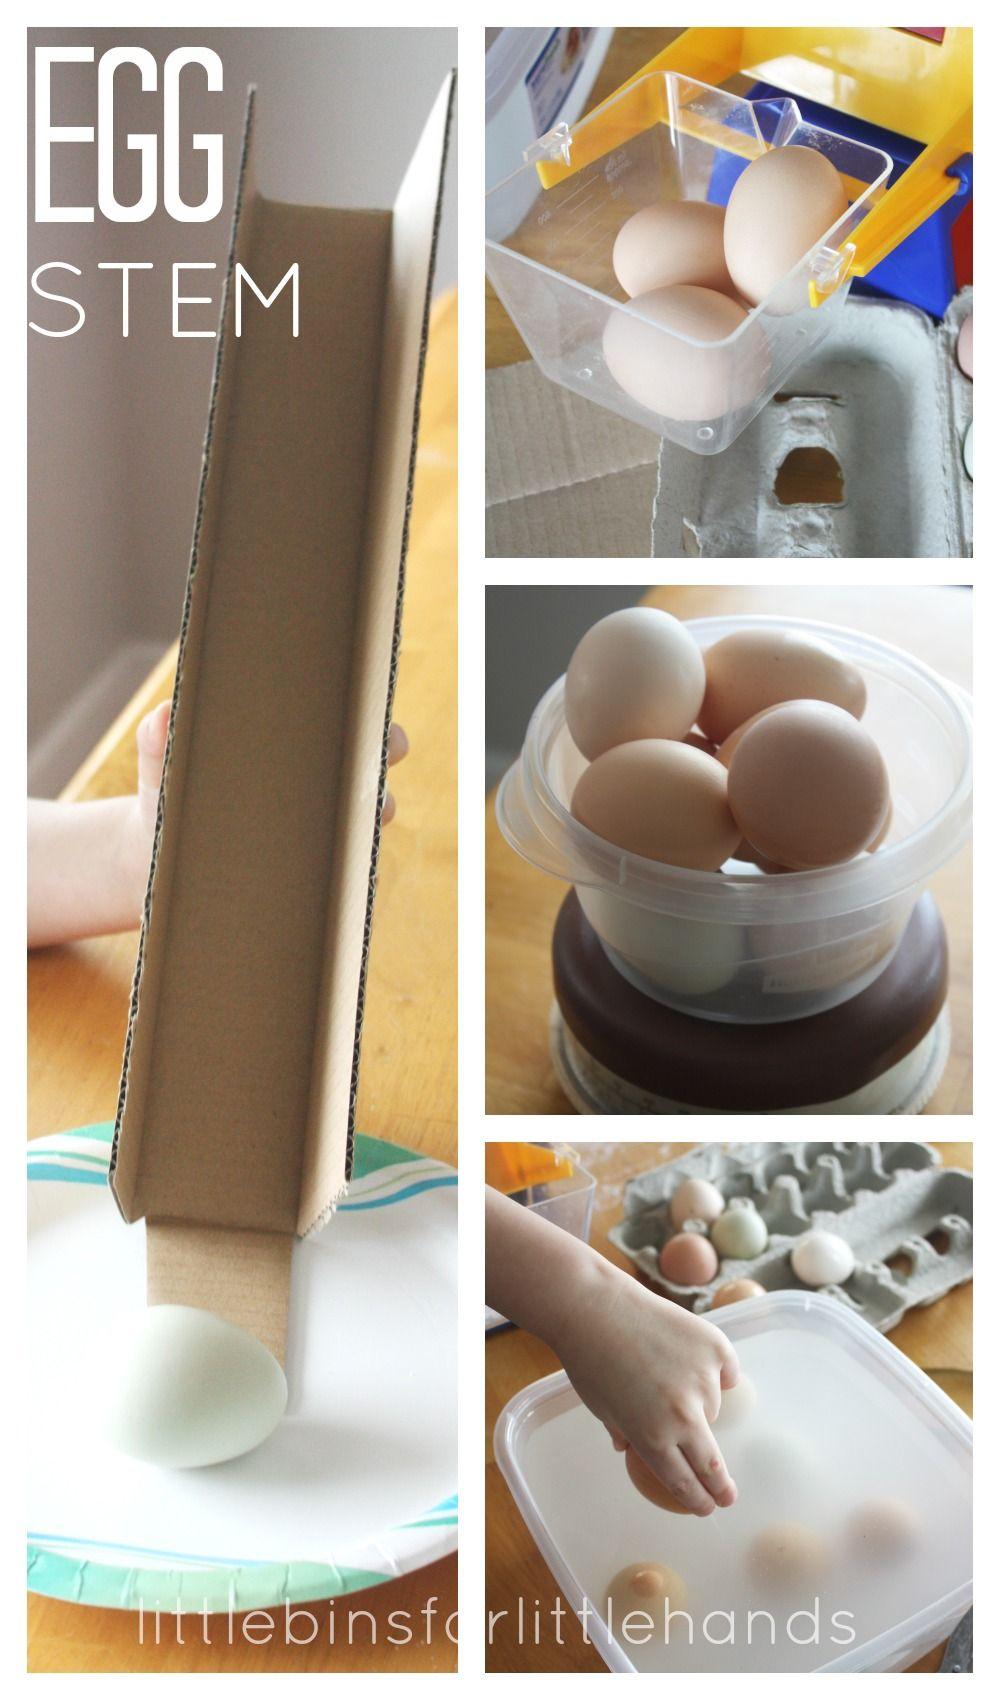 egg stem real egg science activities for kids activities egg and stem activities. Black Bedroom Furniture Sets. Home Design Ideas